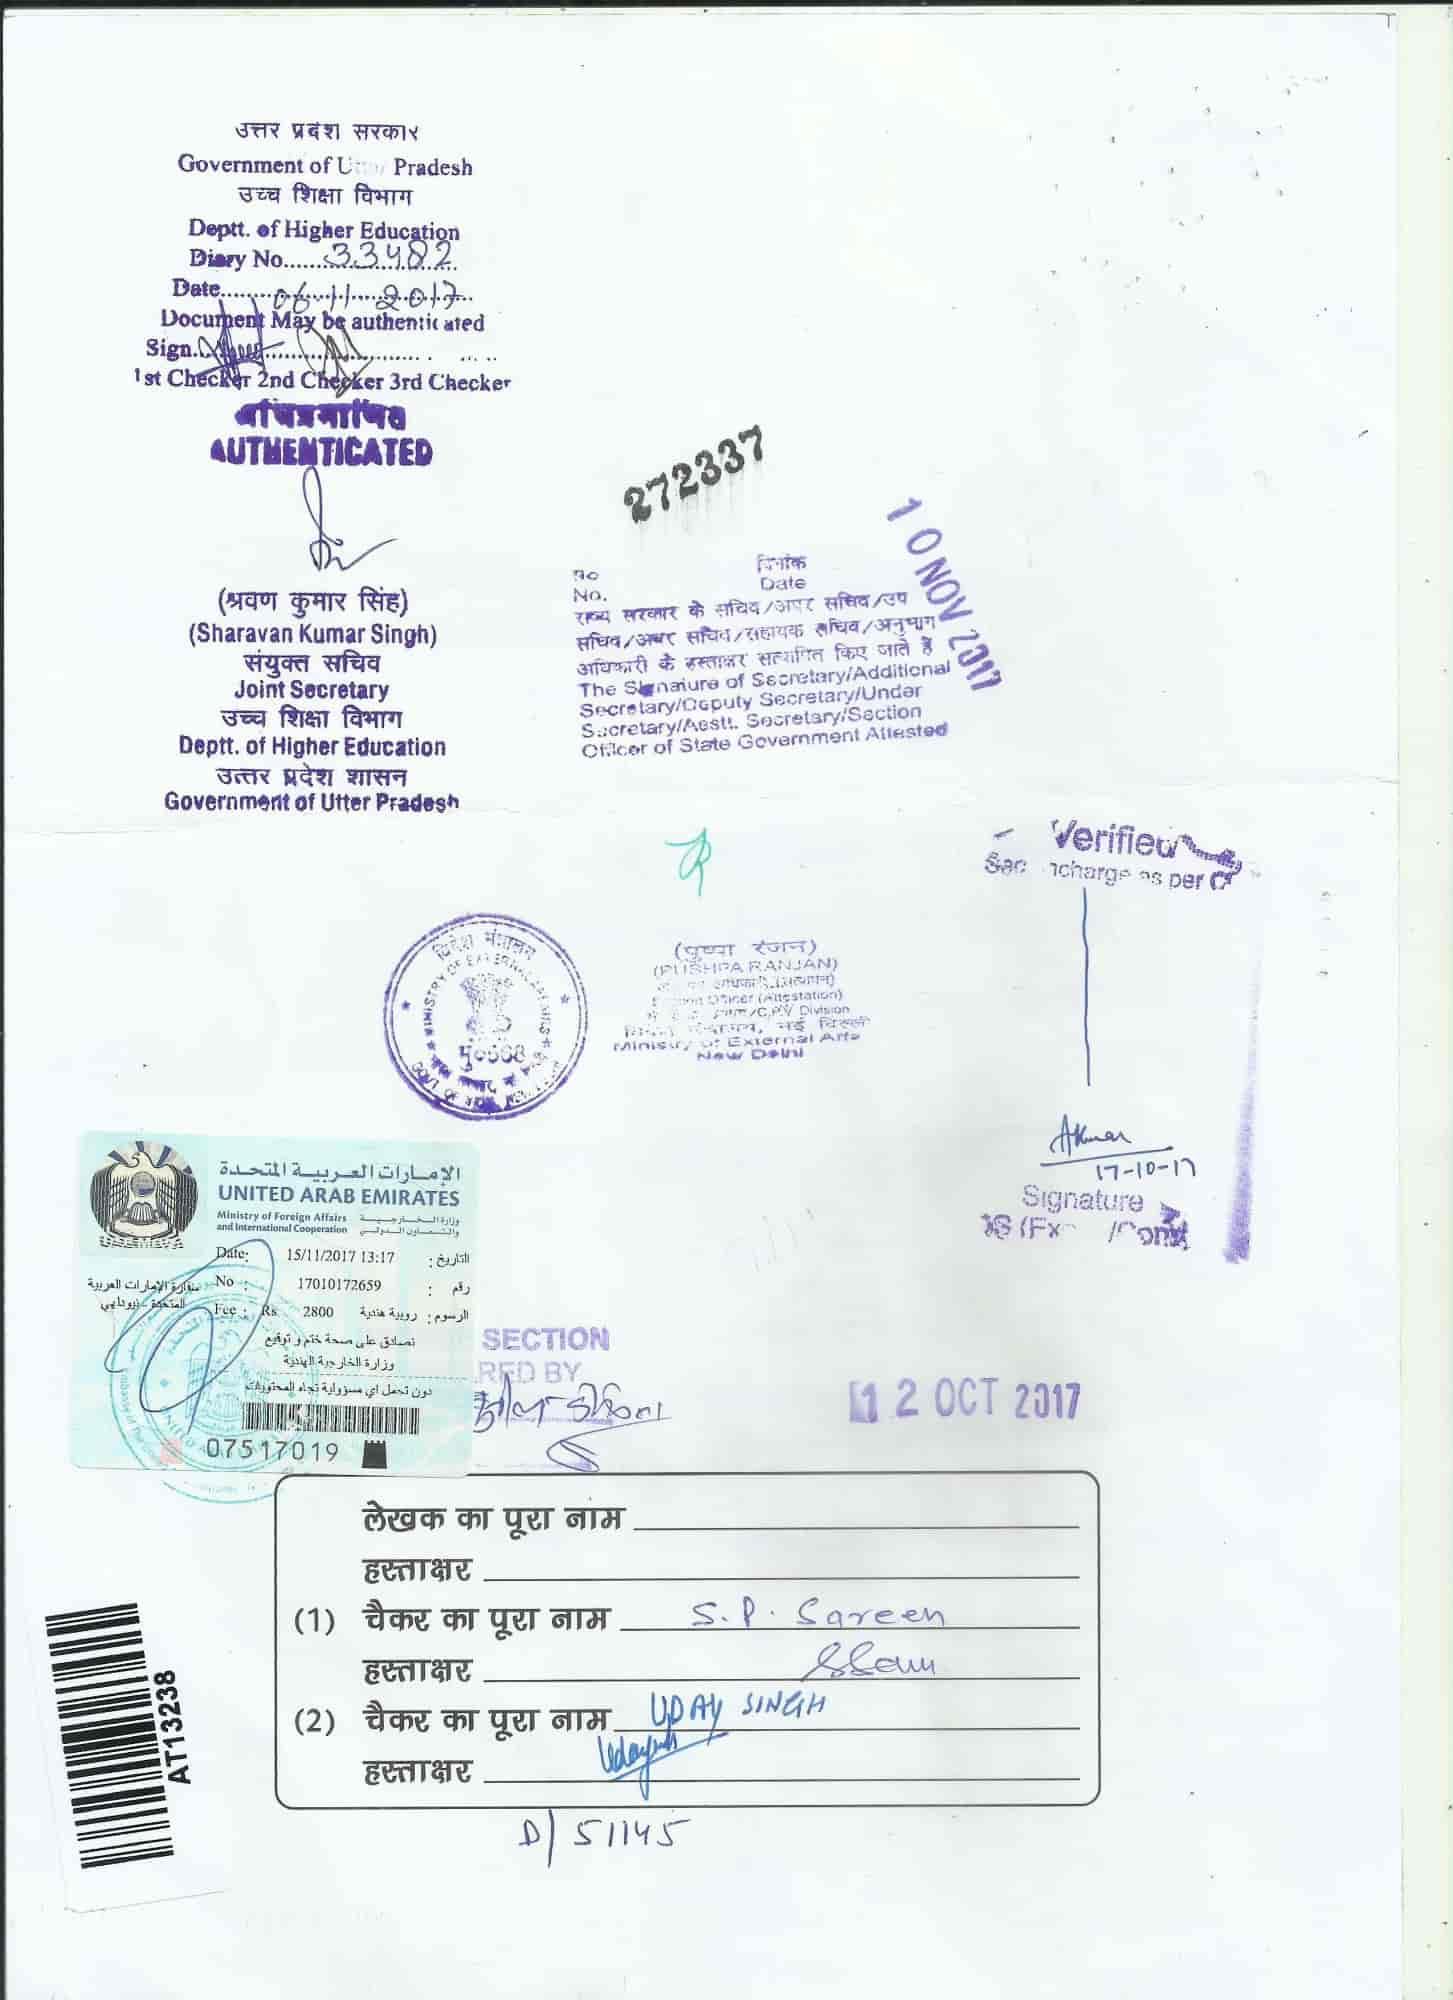 Urogulf Global Service Pvt Ltd, Navrangpura - Attestation